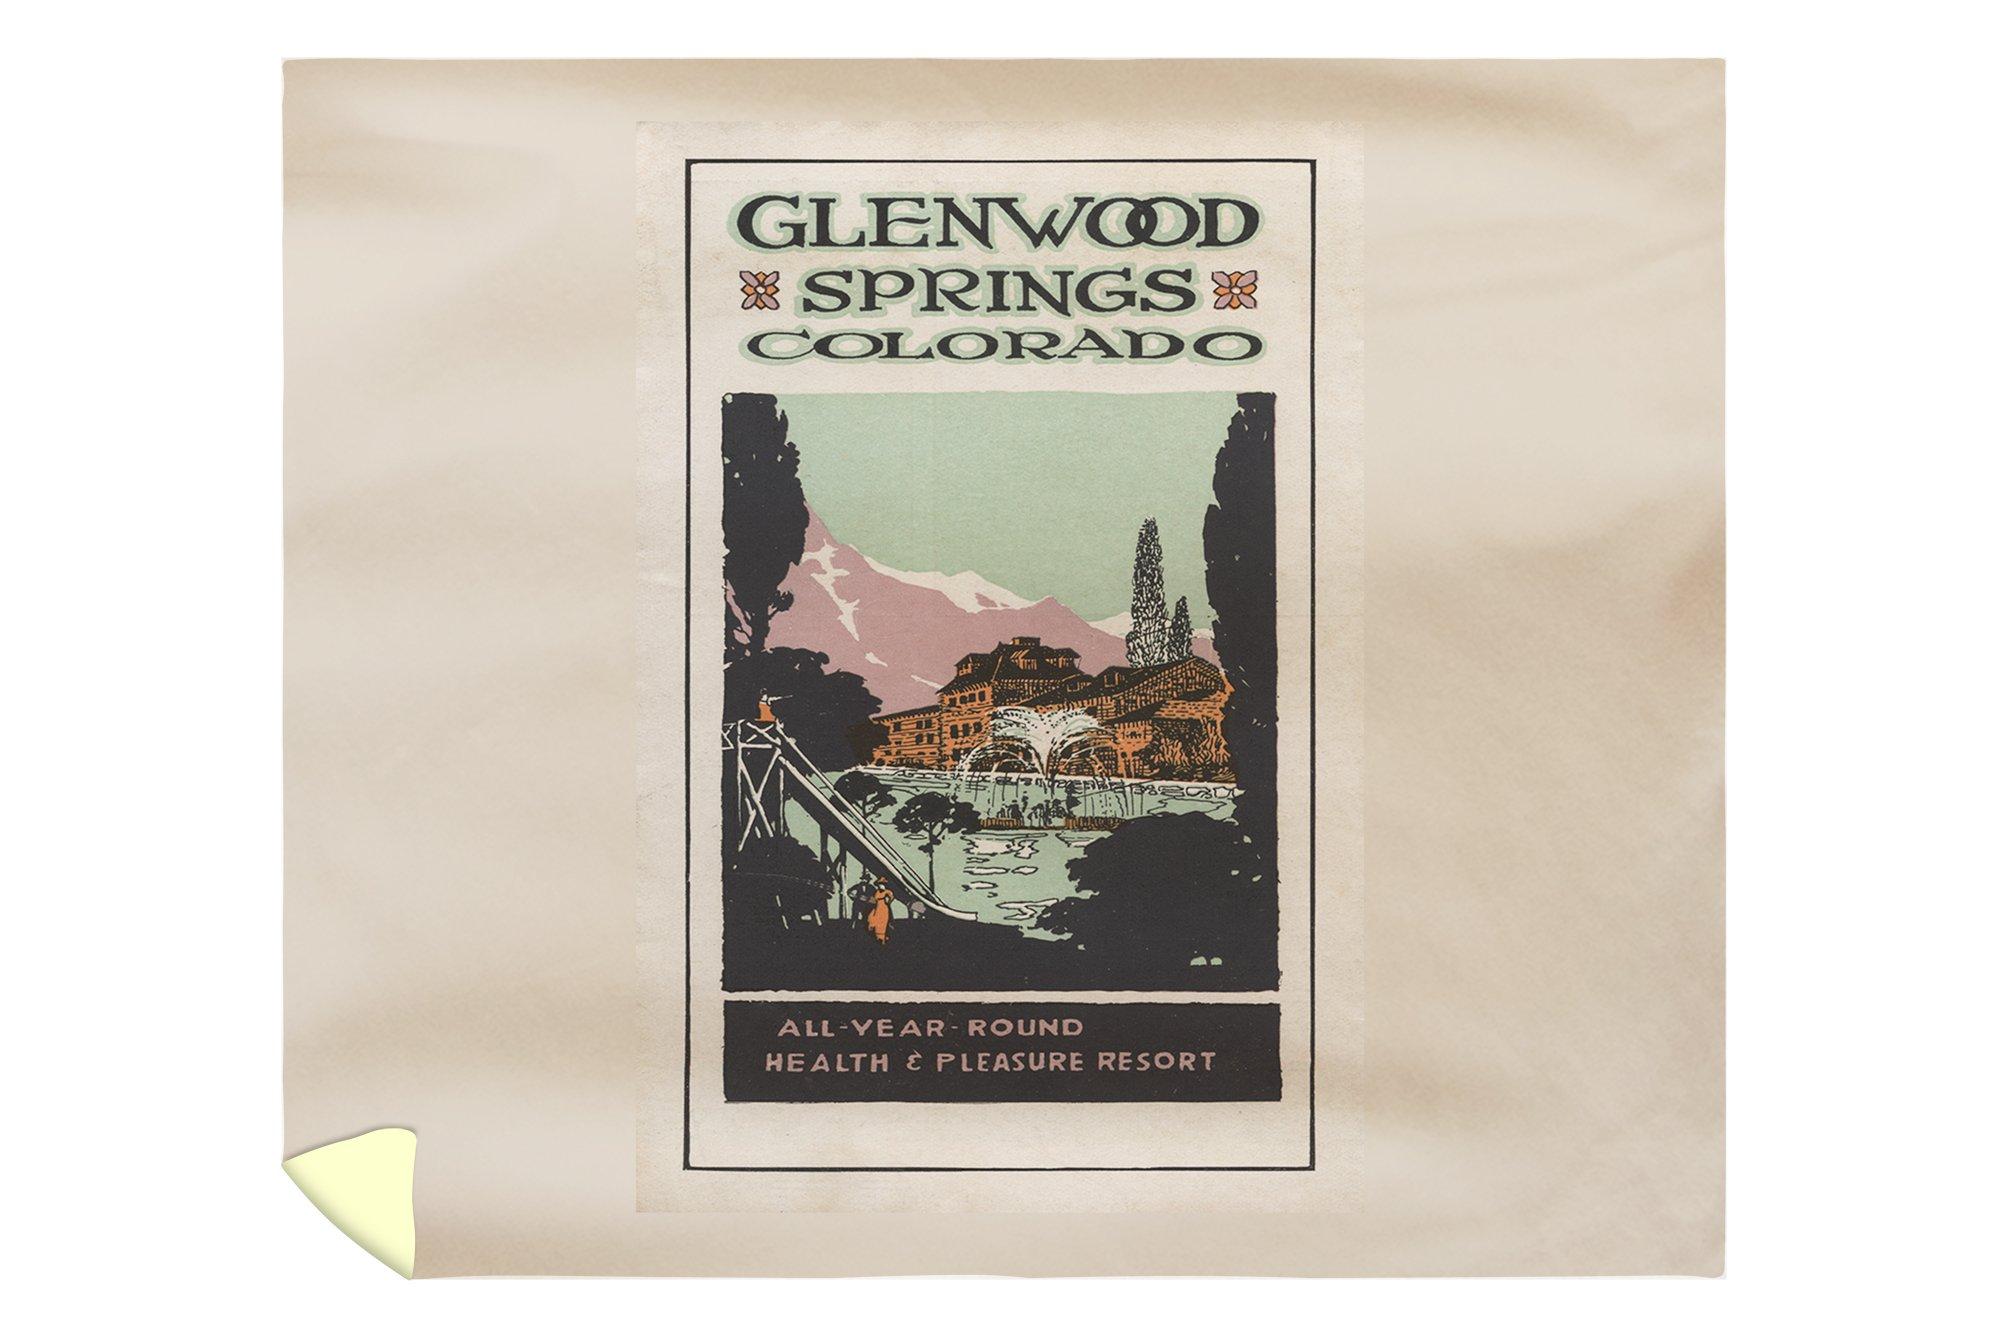 Glenwood Springs, Colorado - Health Resort #2 - Vintage Travel Advertisement (88x104 King Microfiber Duvet Cover)